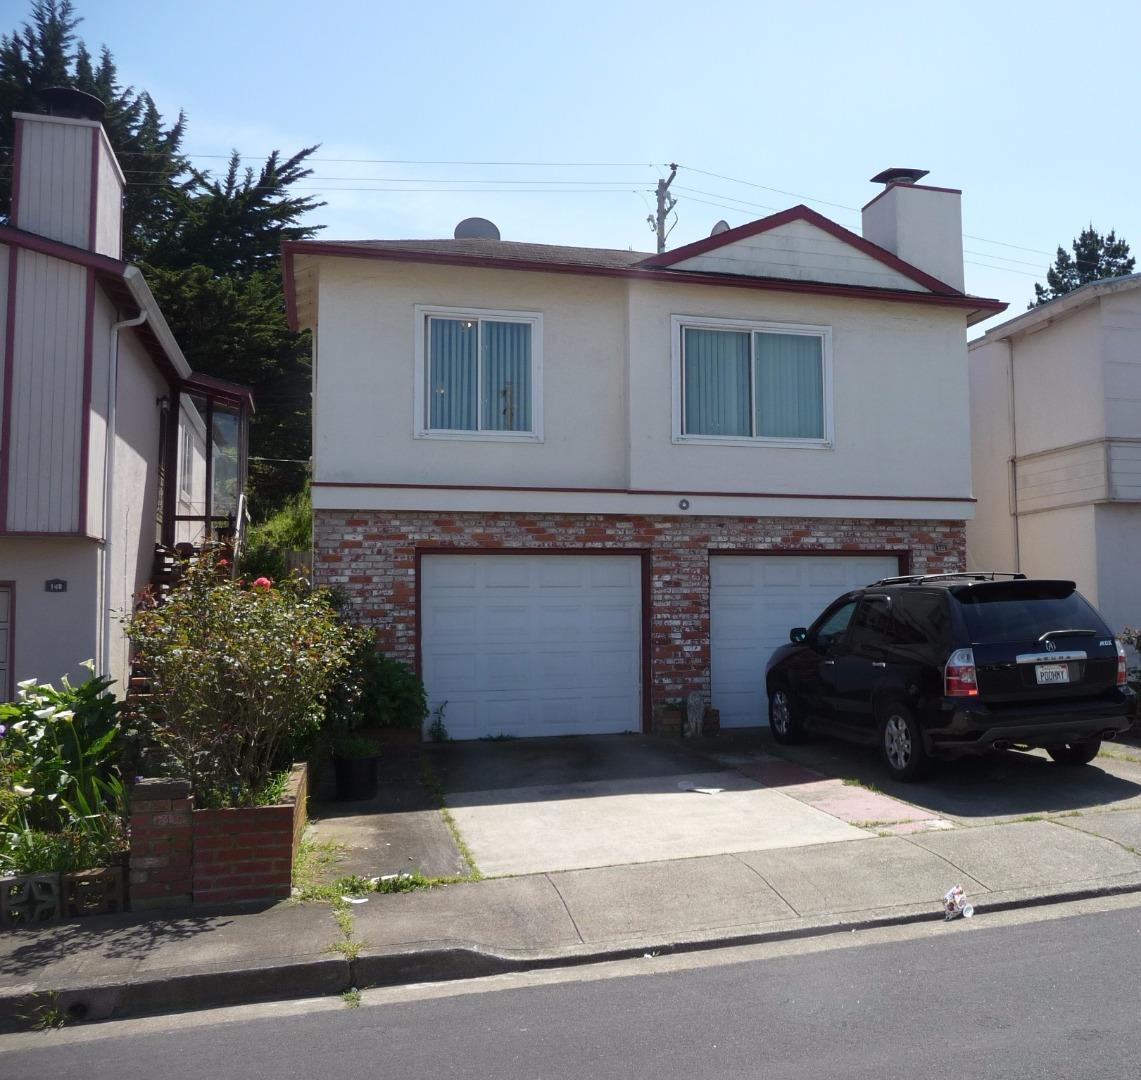 153 Alta Vista Way, Daly City, CA 94014